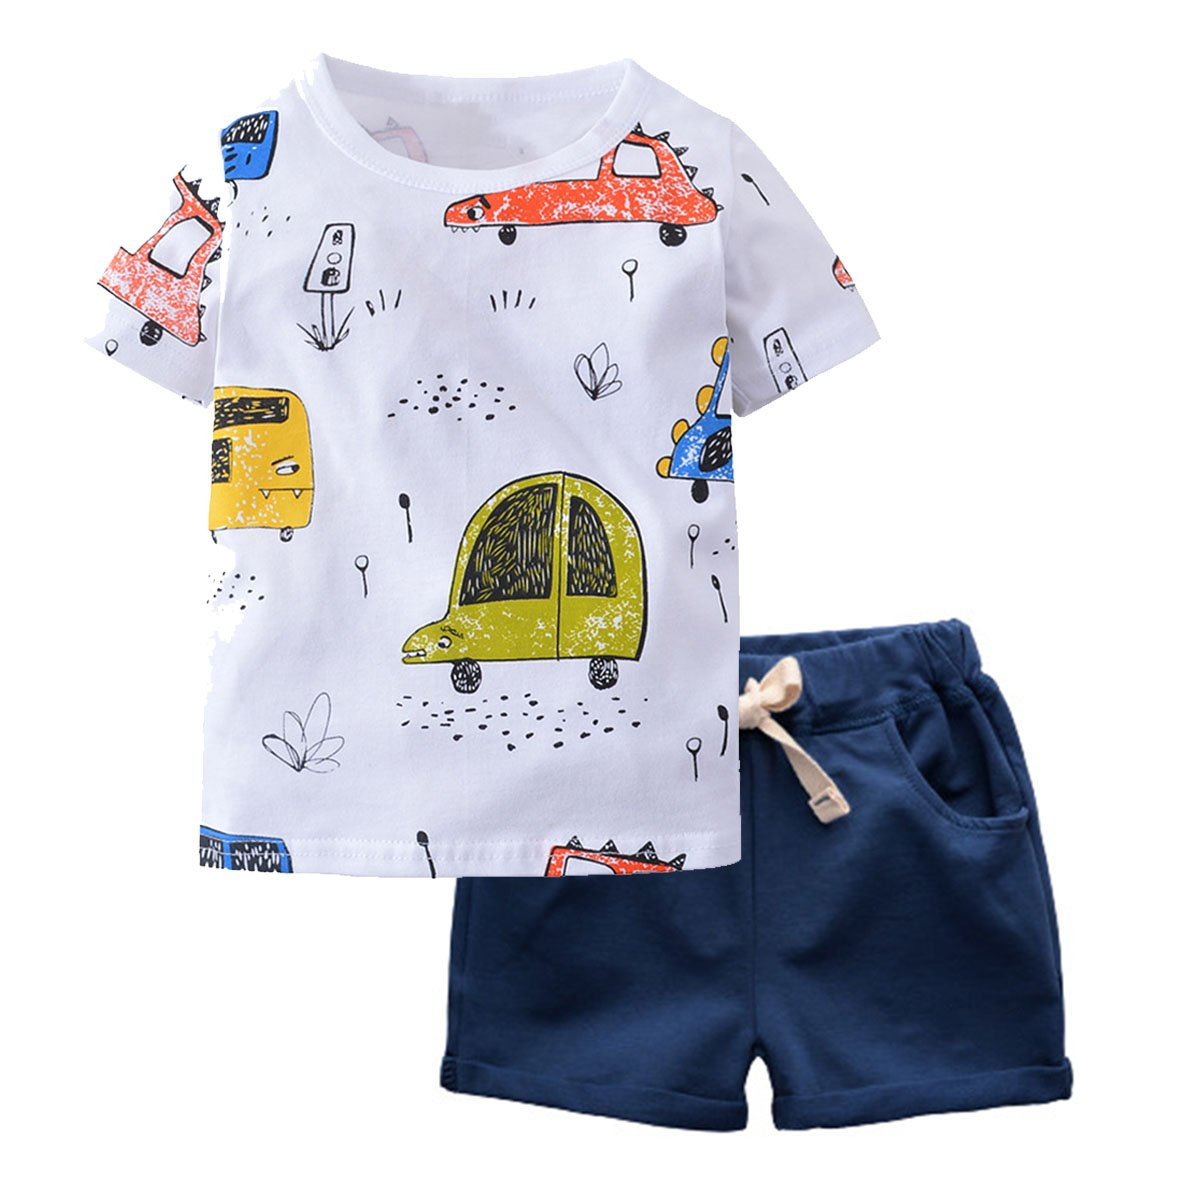 Little Boy Clothing Set Toddler Kid Cute Car Print T-Shirt Navy Shorts Outfit 2T